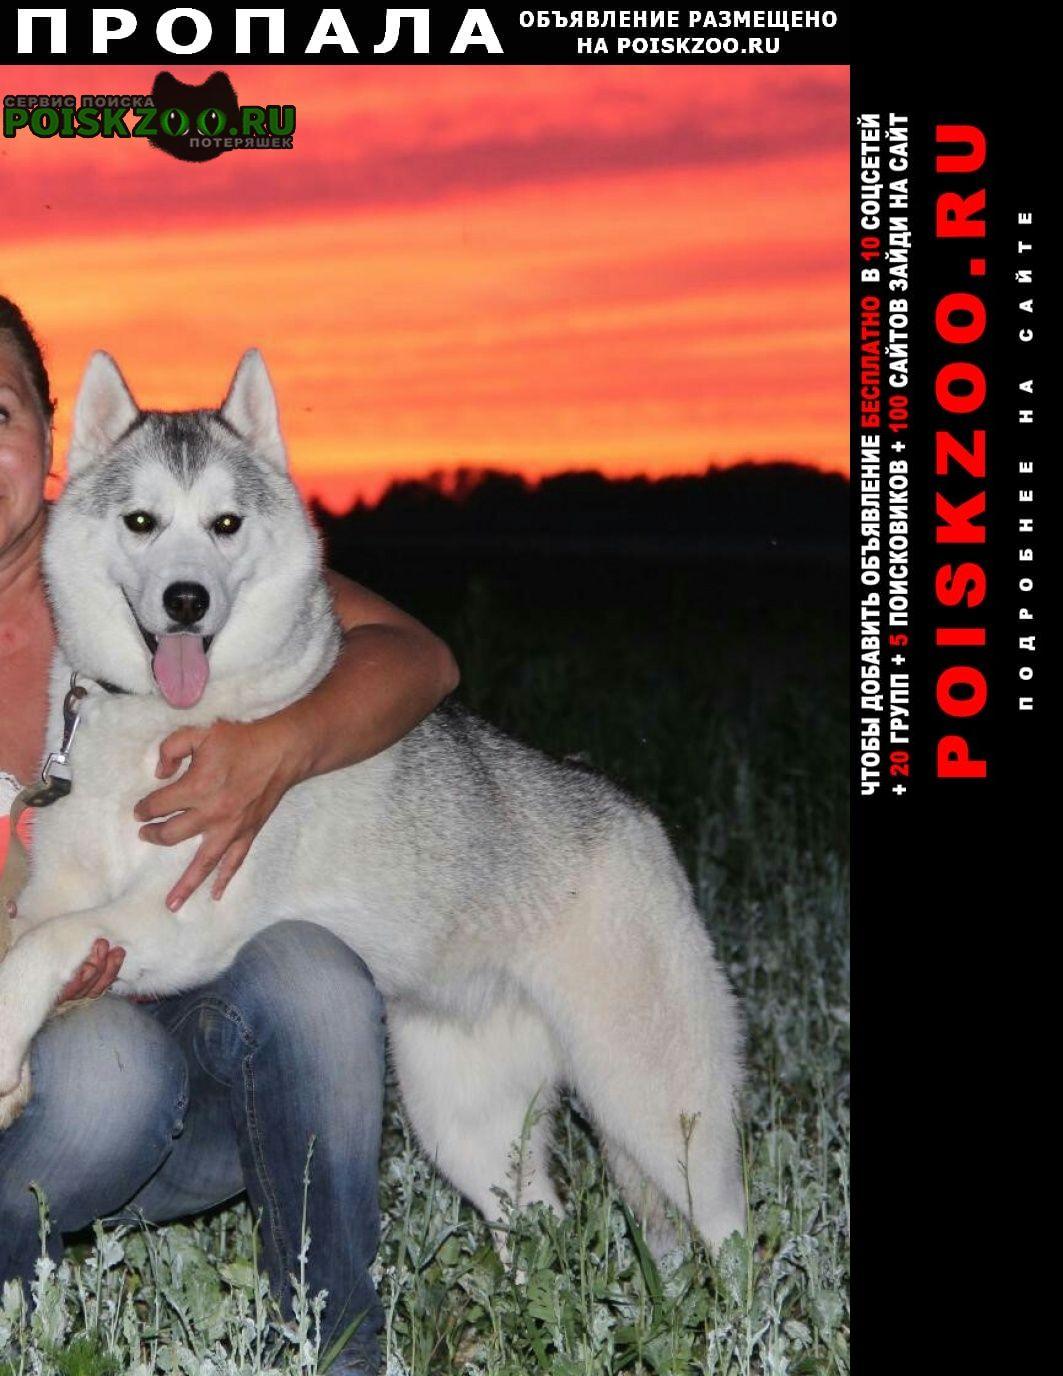 Пропала собака г.Кострома